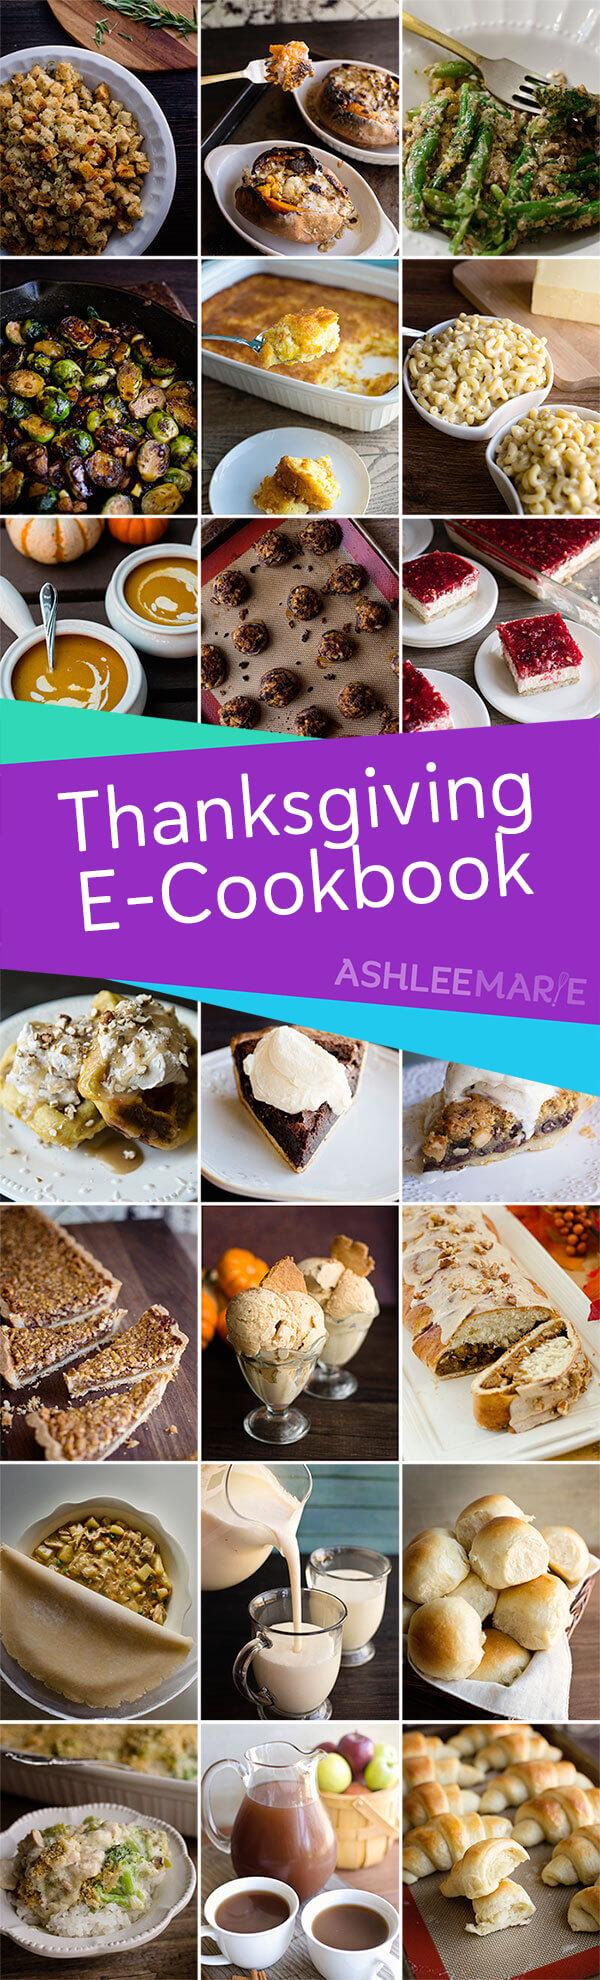 Thanksgiving recipe e cookbook